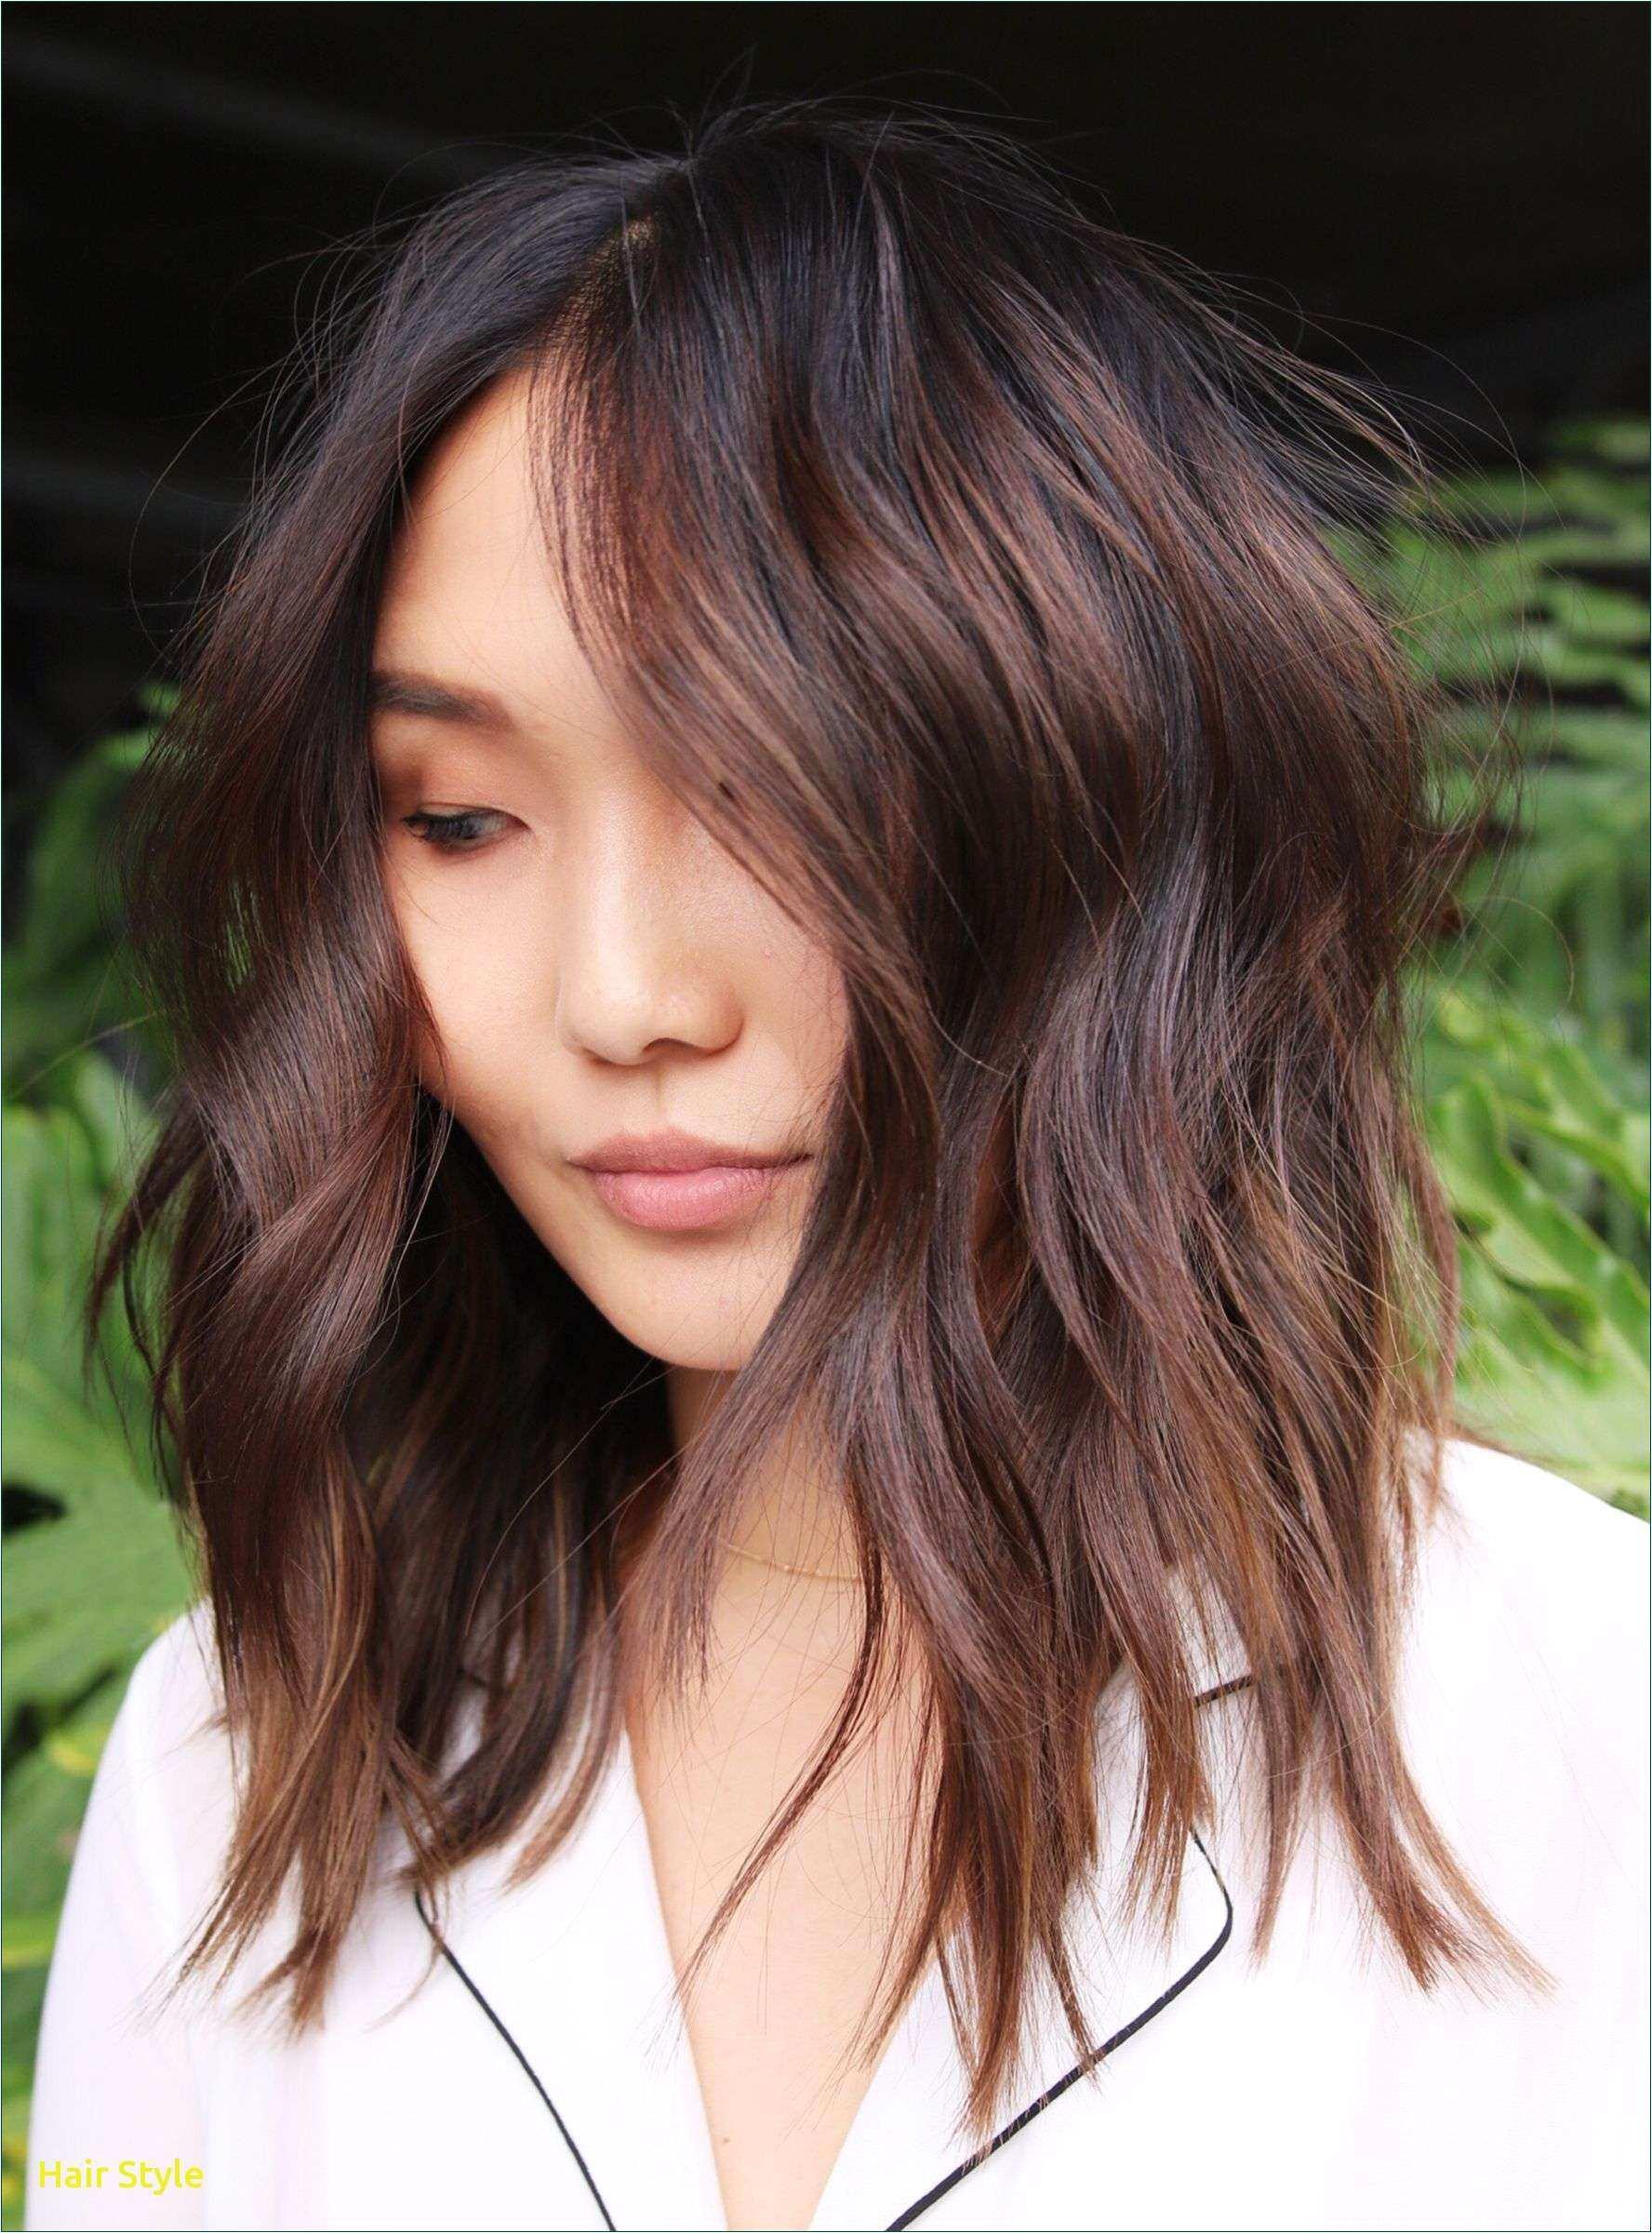 Mid Length Haircuts for Curly Hair Simple T32z Korean Medium Length Hairstyle 2016 Lovely Korean Hair